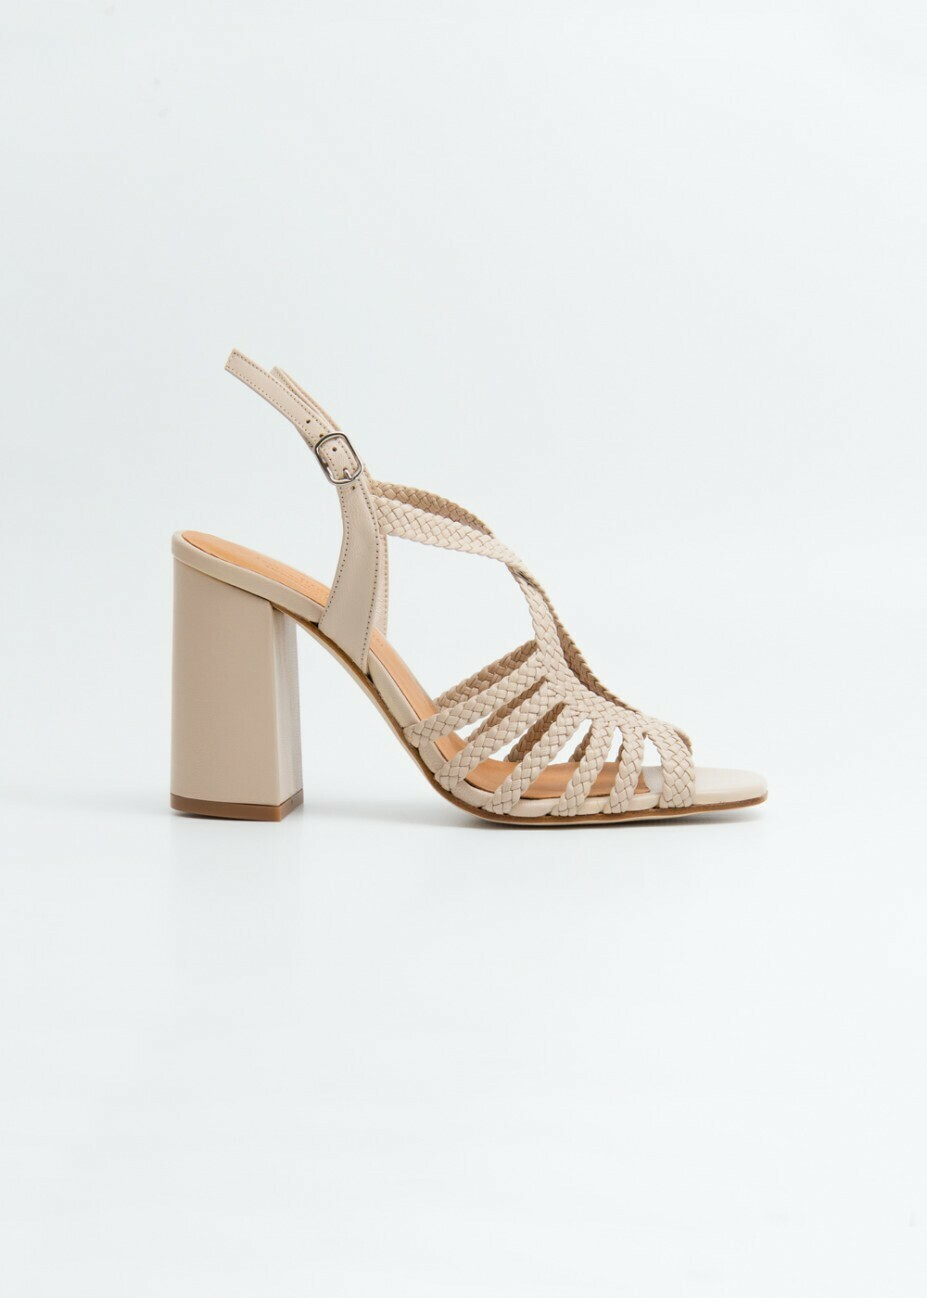 Cua Shoe, Naguisa